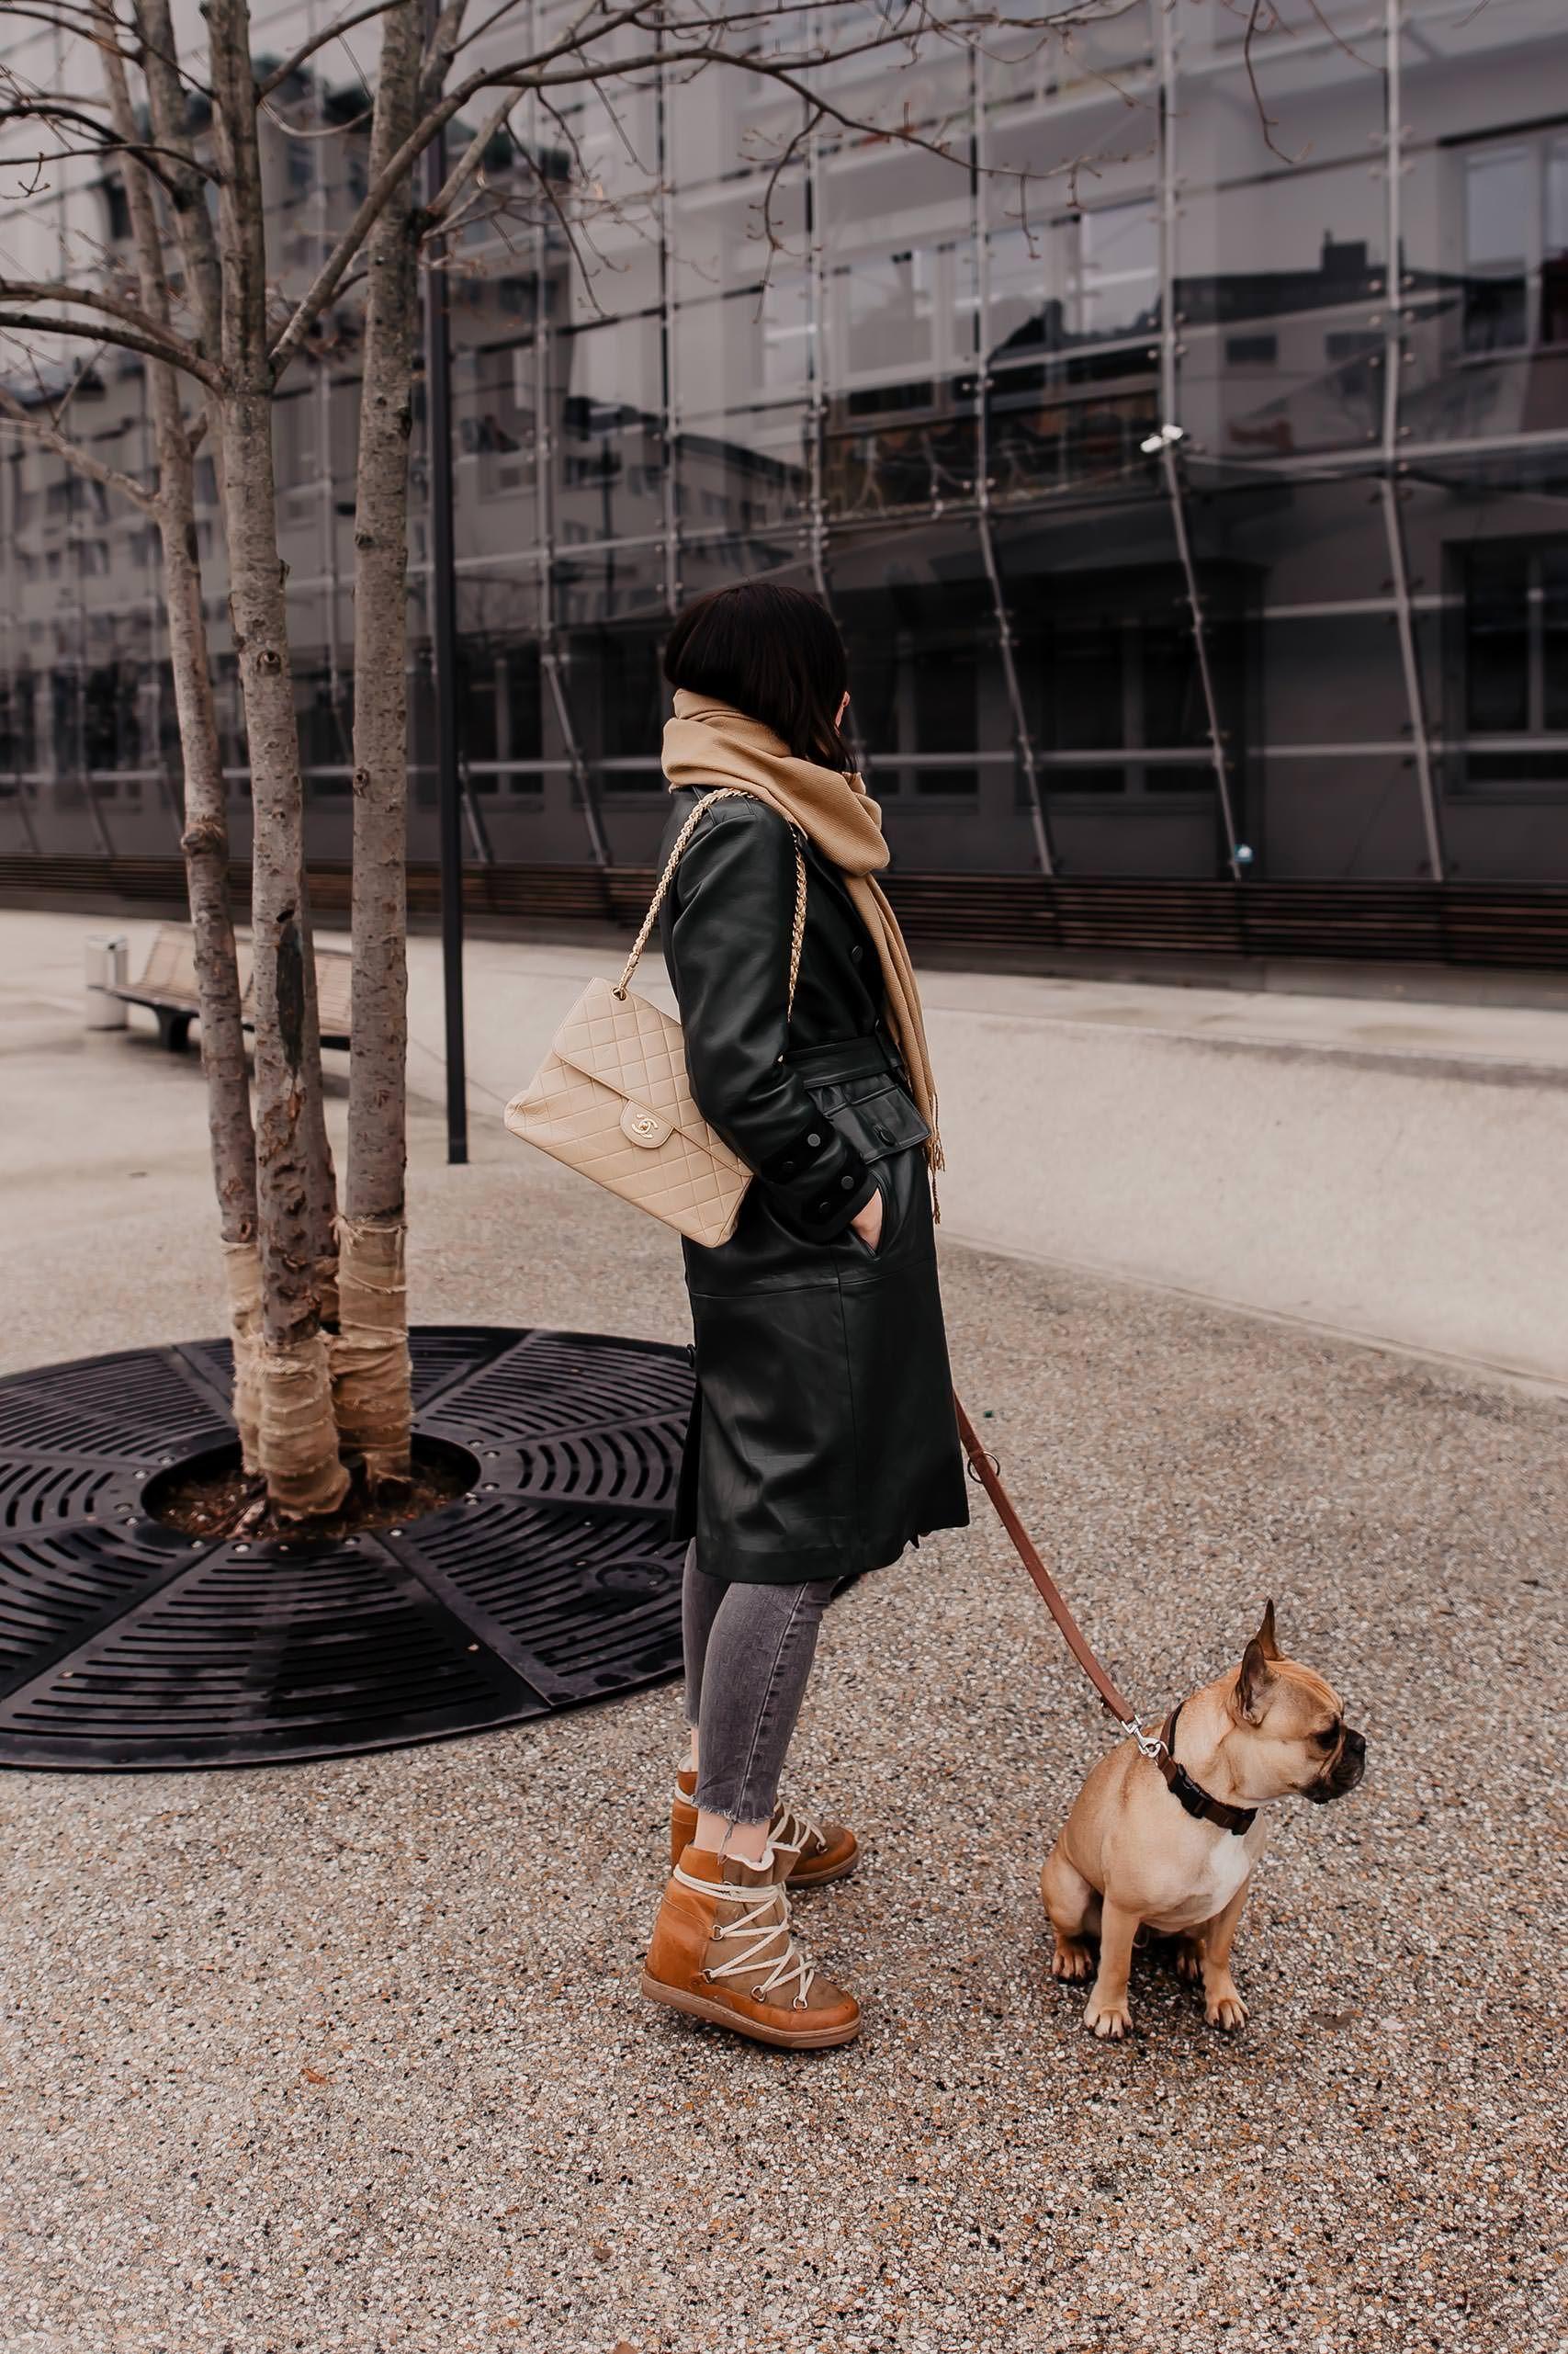 finest selection 7a5a7 28dac Die besten Schuhe für kalte Tage: Isabel Marant Nowles Boots ...